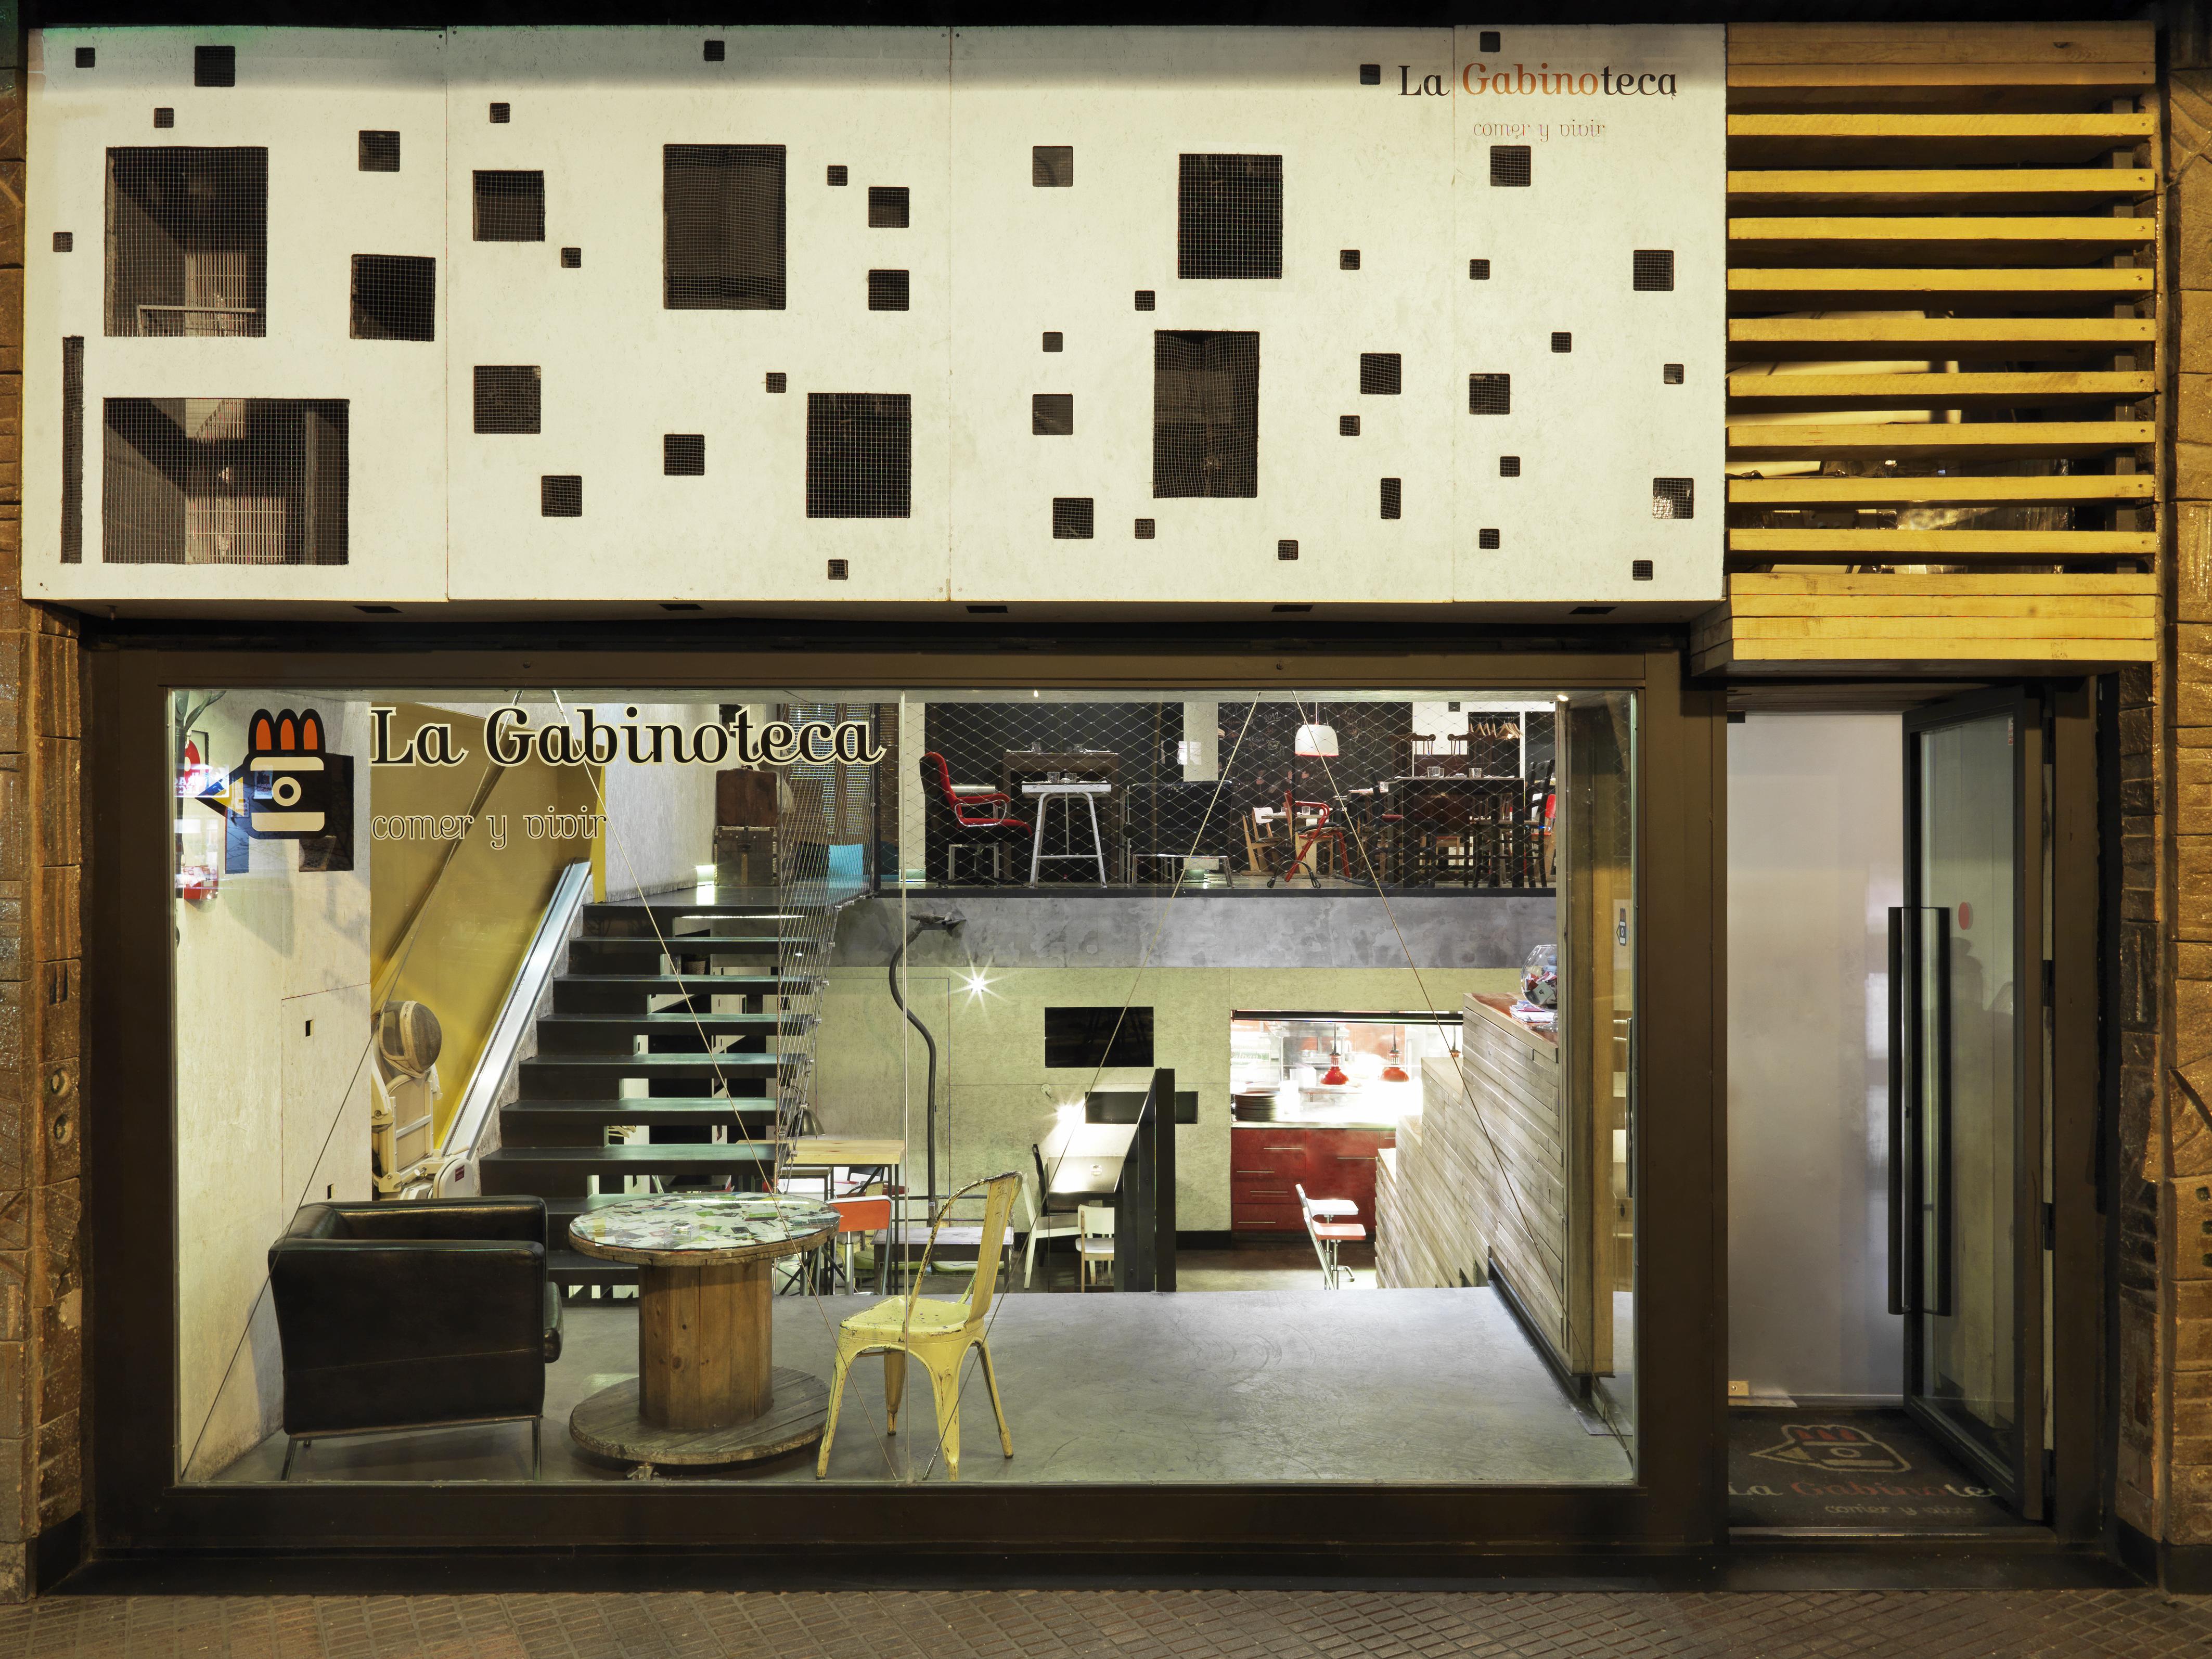 Arquitecturas eficientes en restaurante la gabinoteca - Arquitectura invisible ...